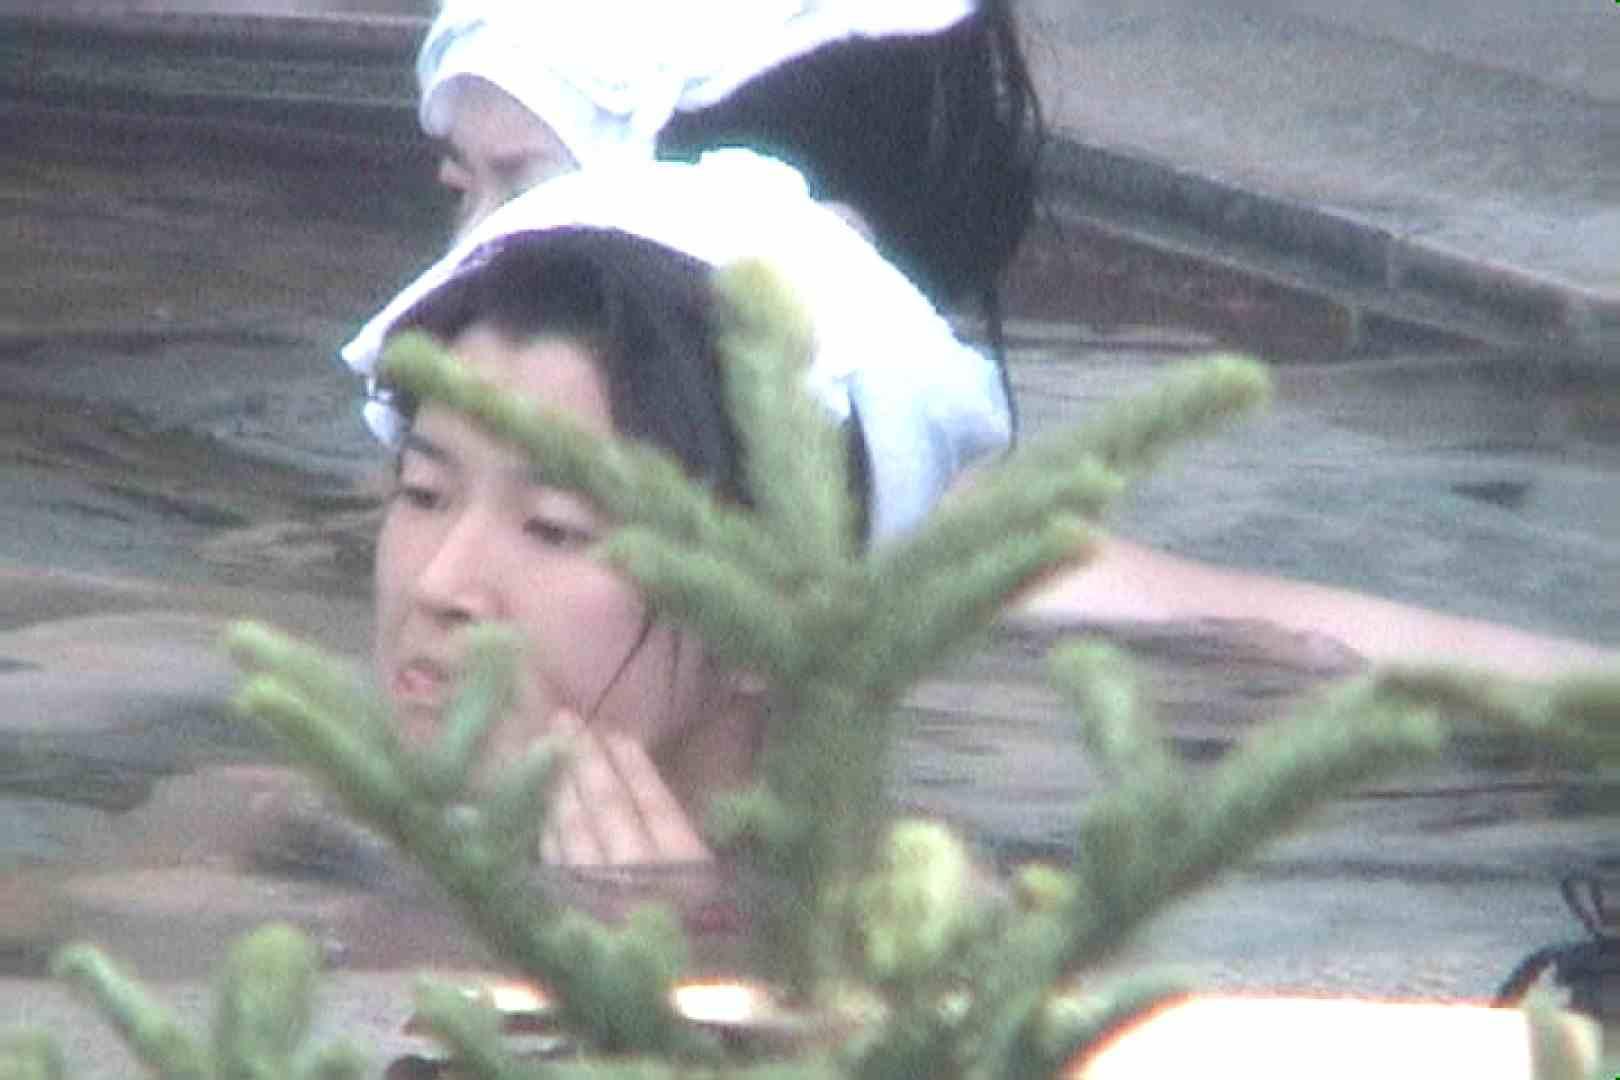 Aquaな露天風呂Vol.80【VIP限定】 盗撮 | HなOL  66pic 63